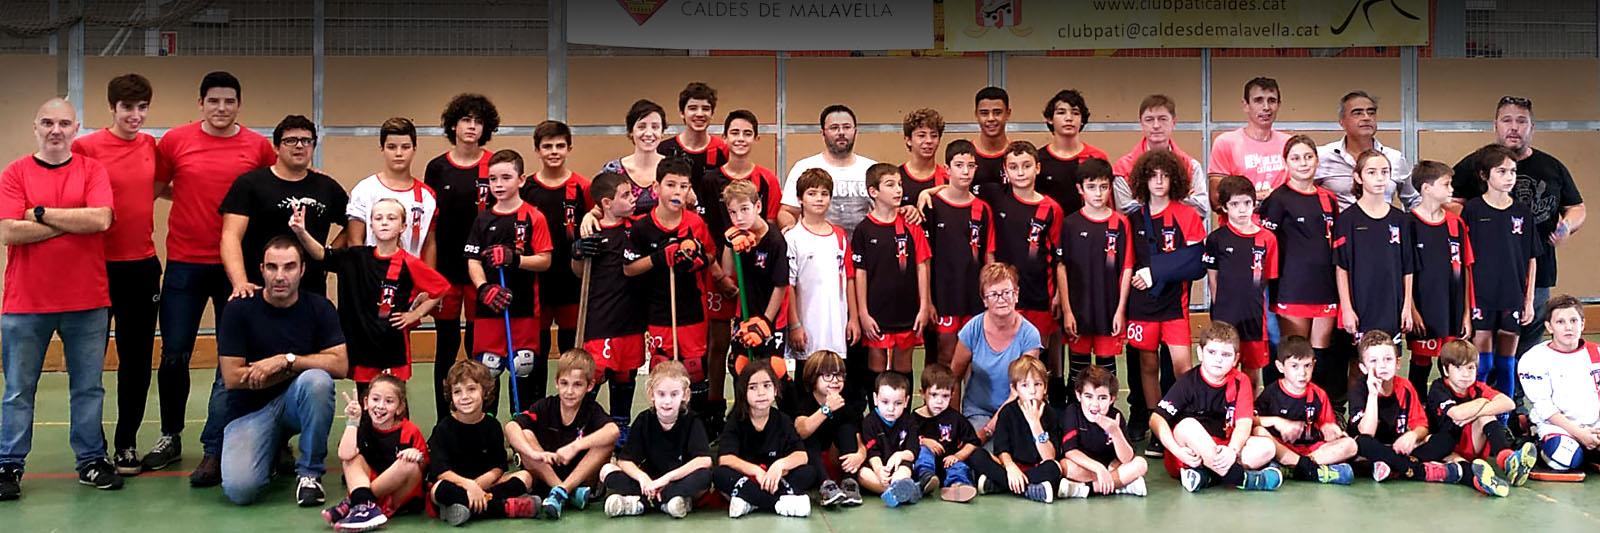 Club Pati Caldes de Malavella. Hoquei Patins. Temporada 2019-2020